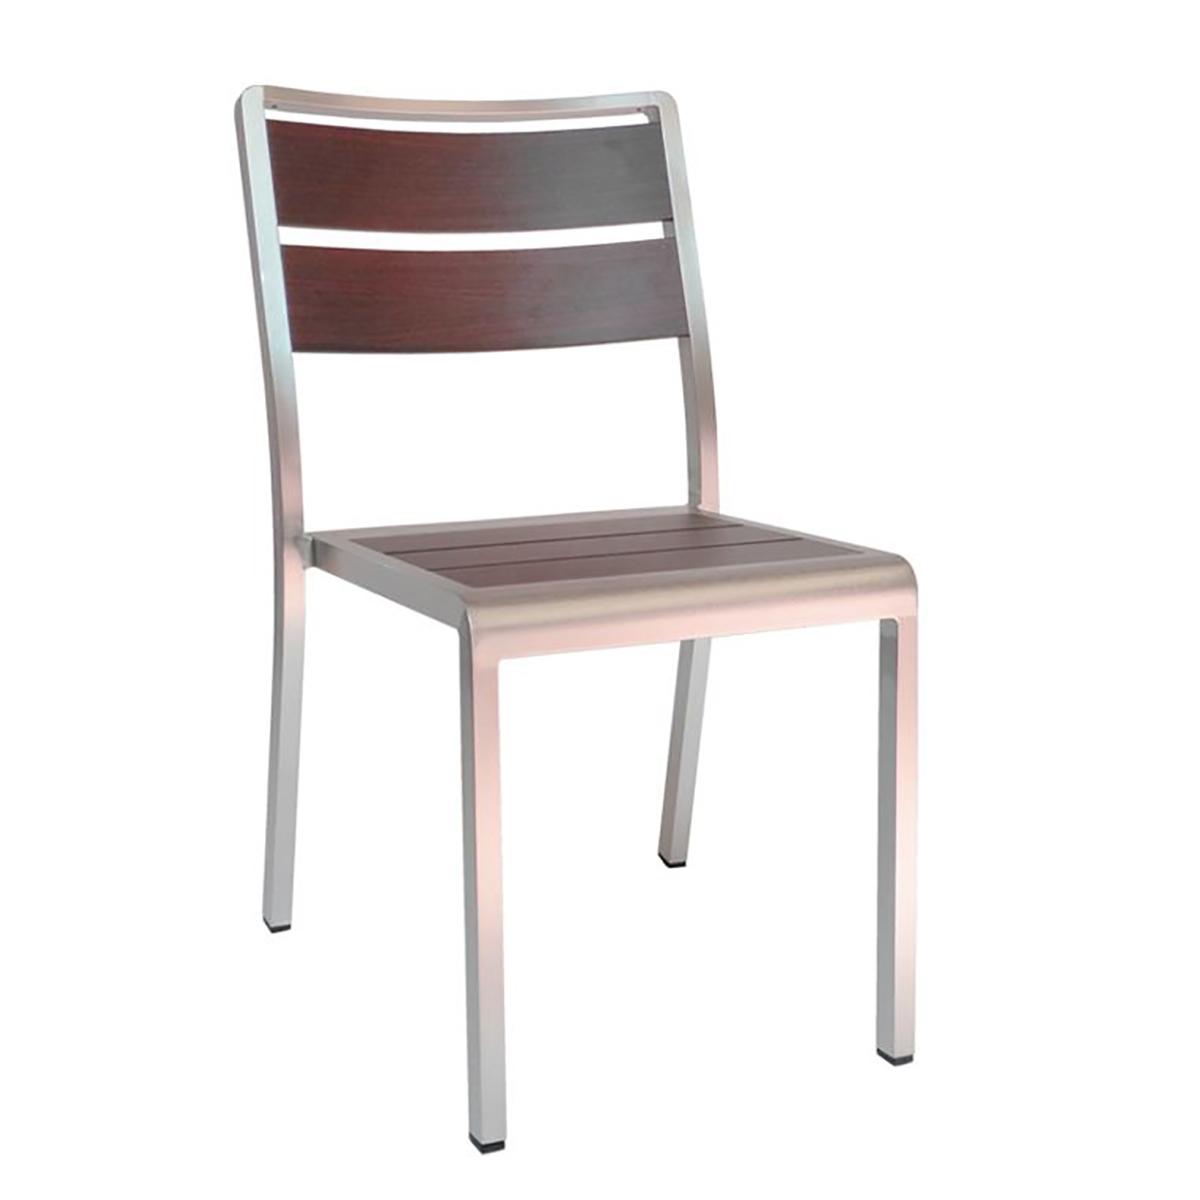 wood look aluminum side chair in wenge